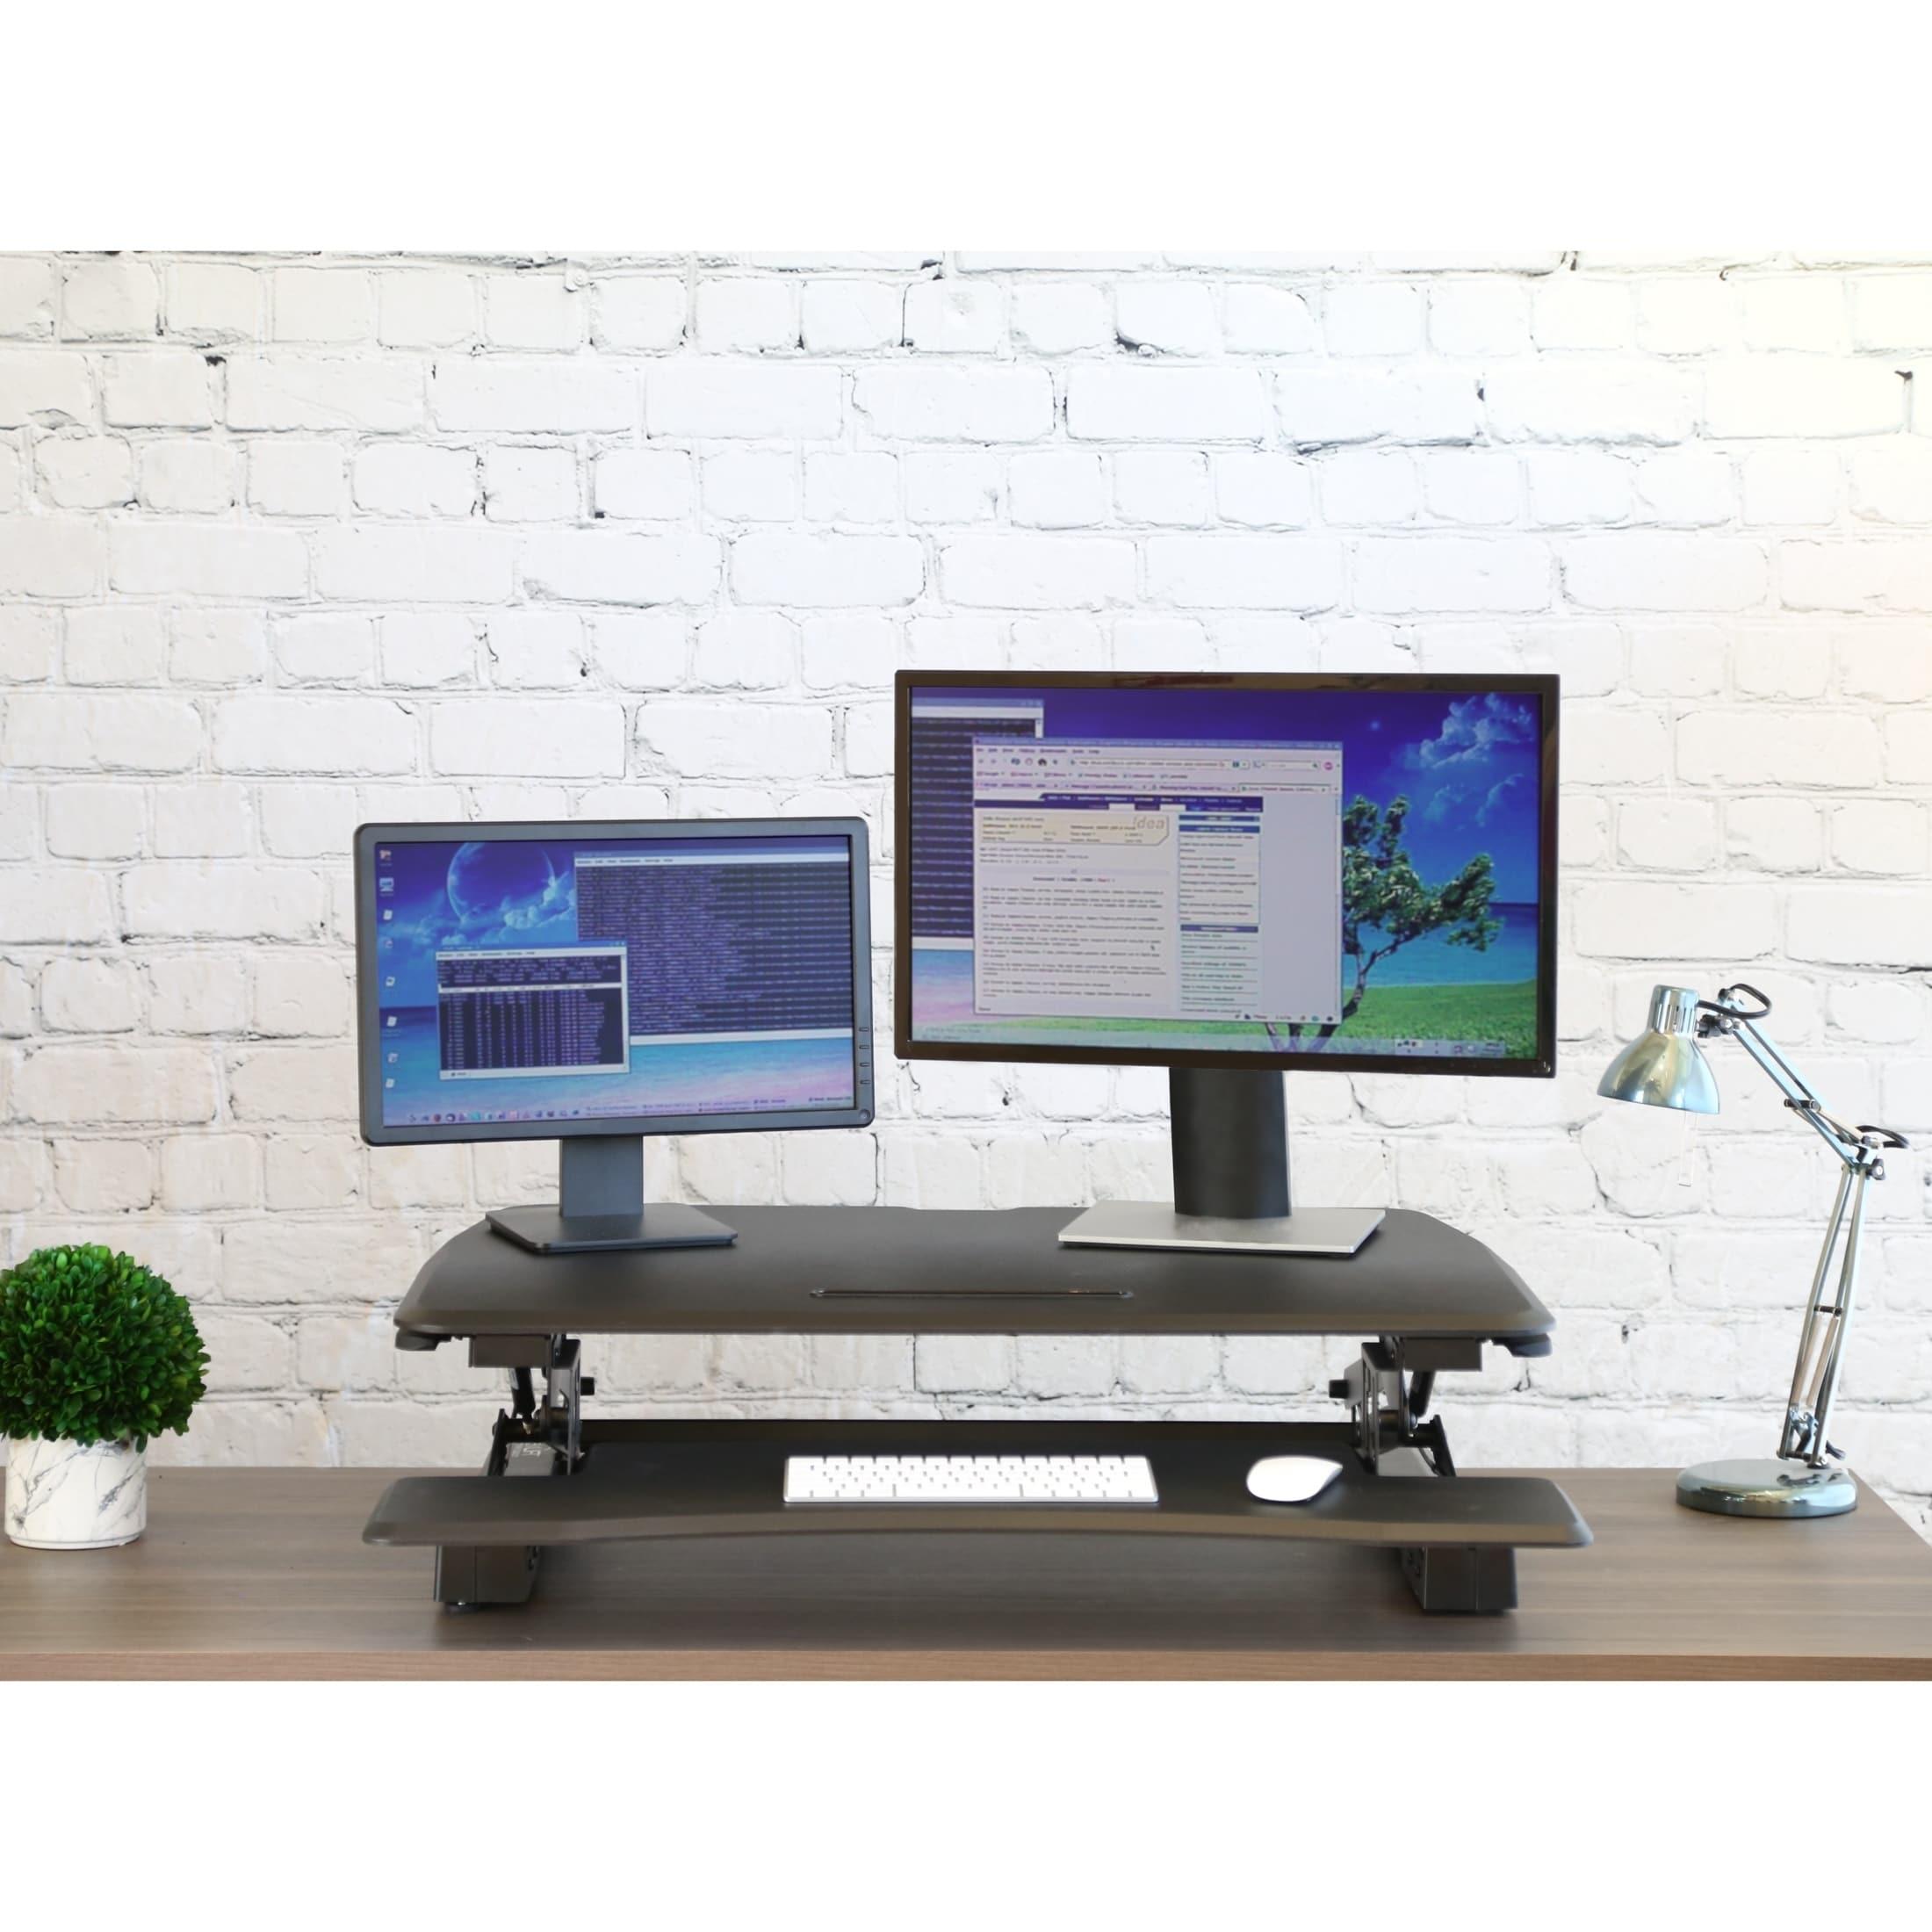 standing workstation monitor for imagination ergotron desk computer laptop mount sit stand preeminent most